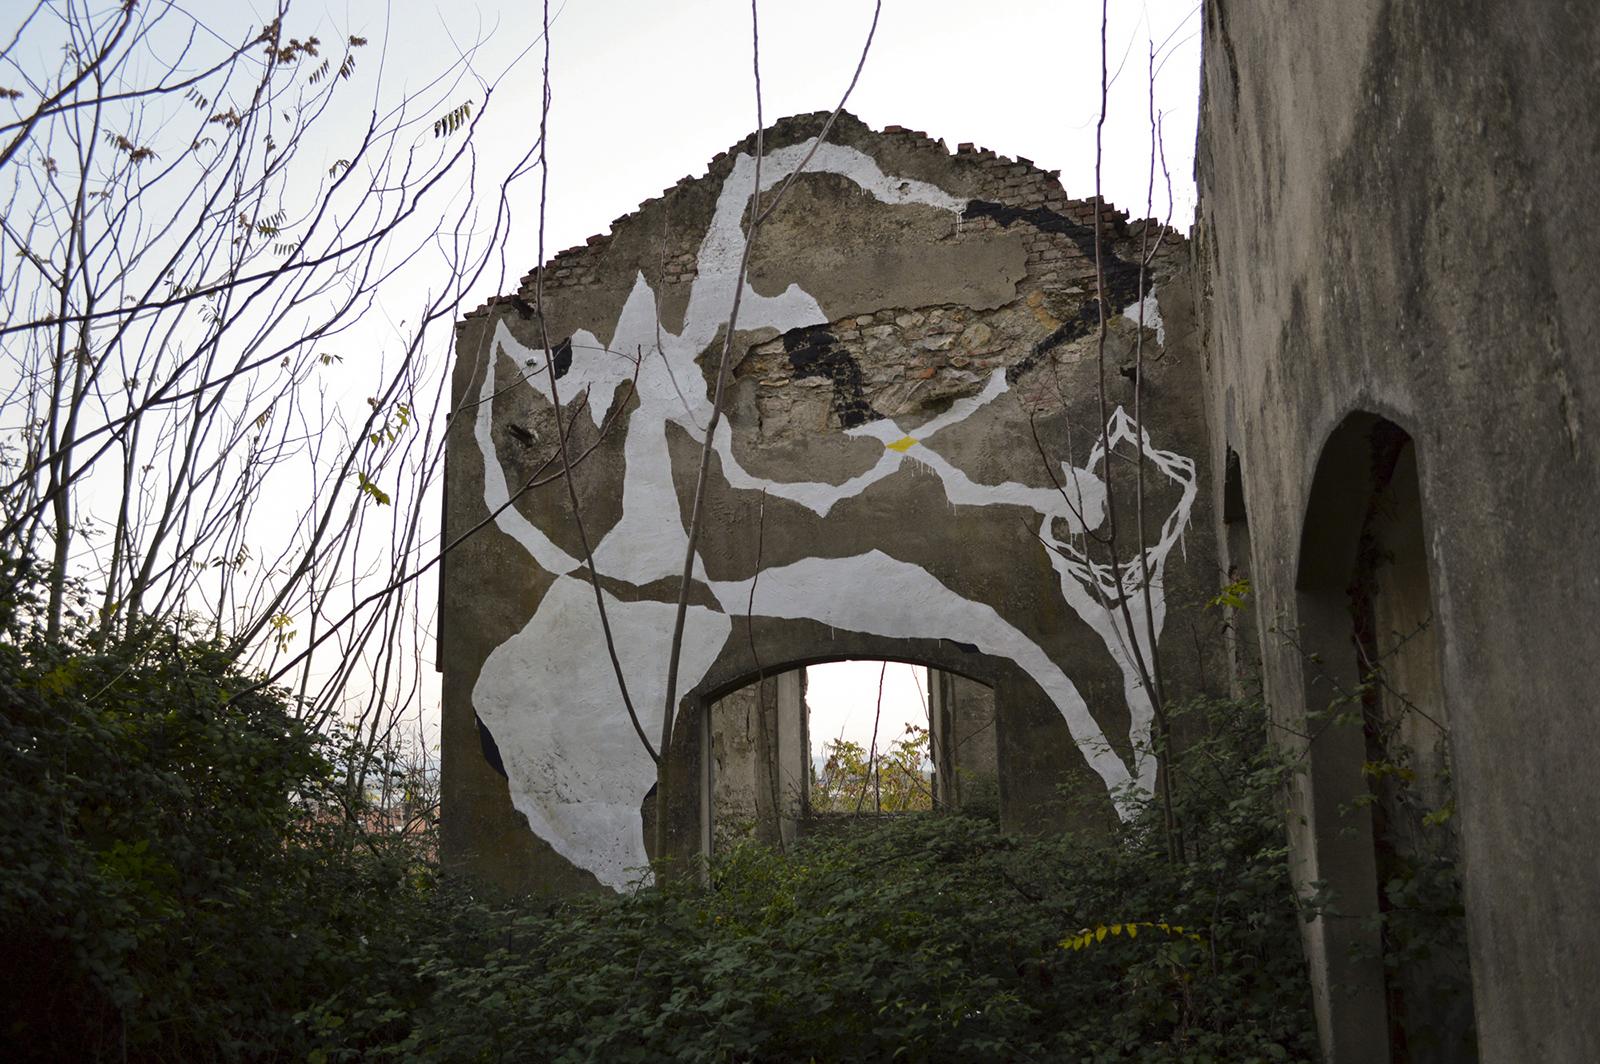 moallaseconda-new-mural-in-prato-09